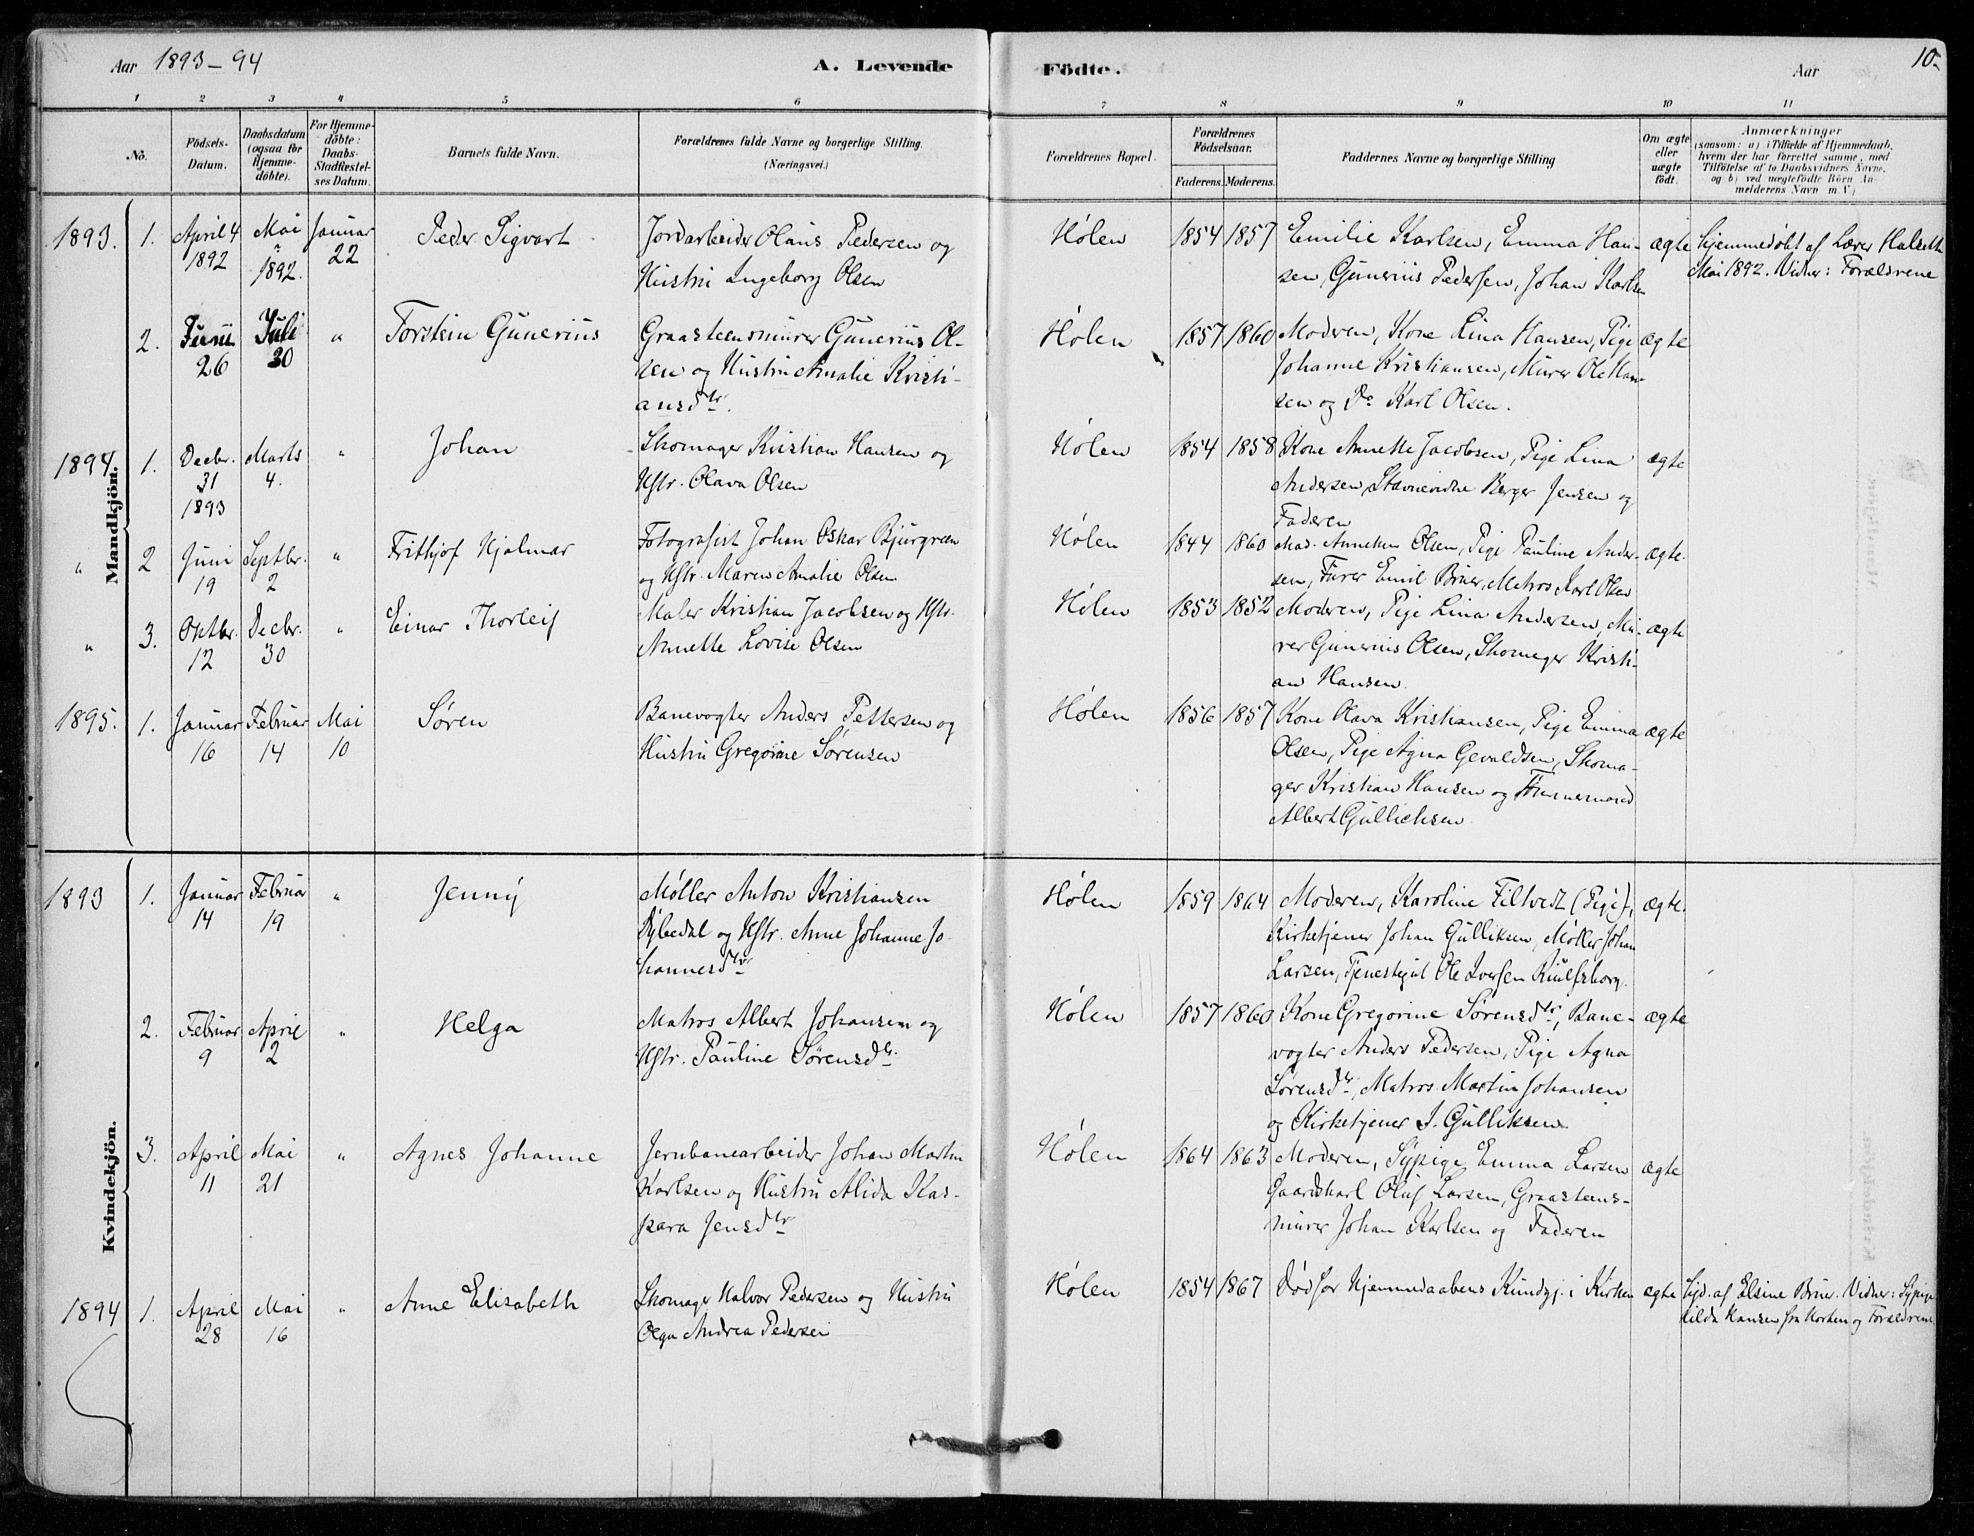 SAO, Vestby prestekontor Kirkebøker, F/Fe/L0001: Ministerialbok nr. V 1, 1878-1931, s. 10